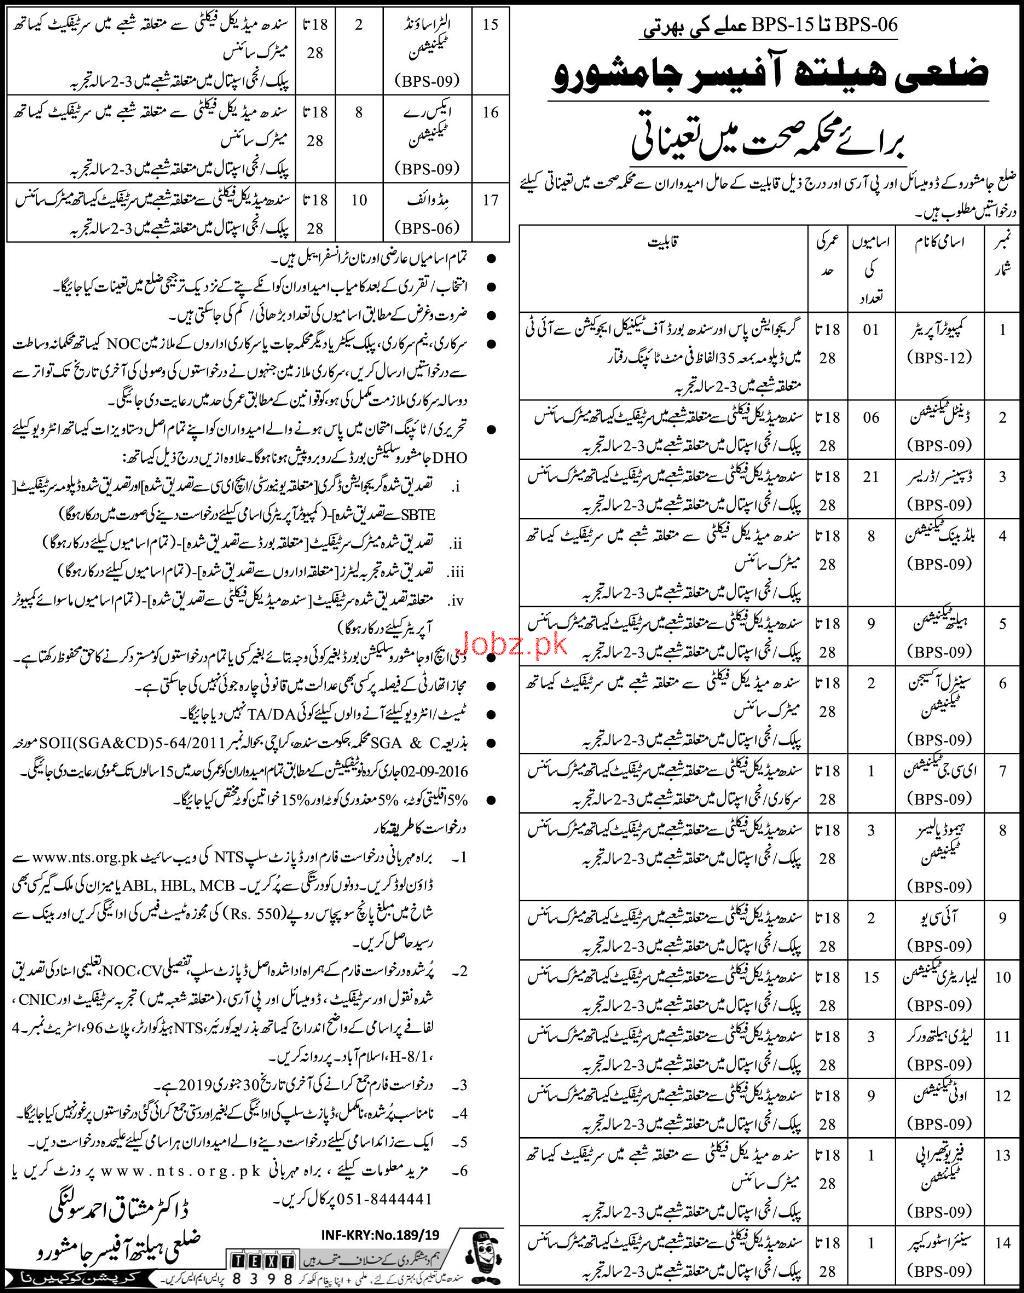 District Health Department Recruitment 2019